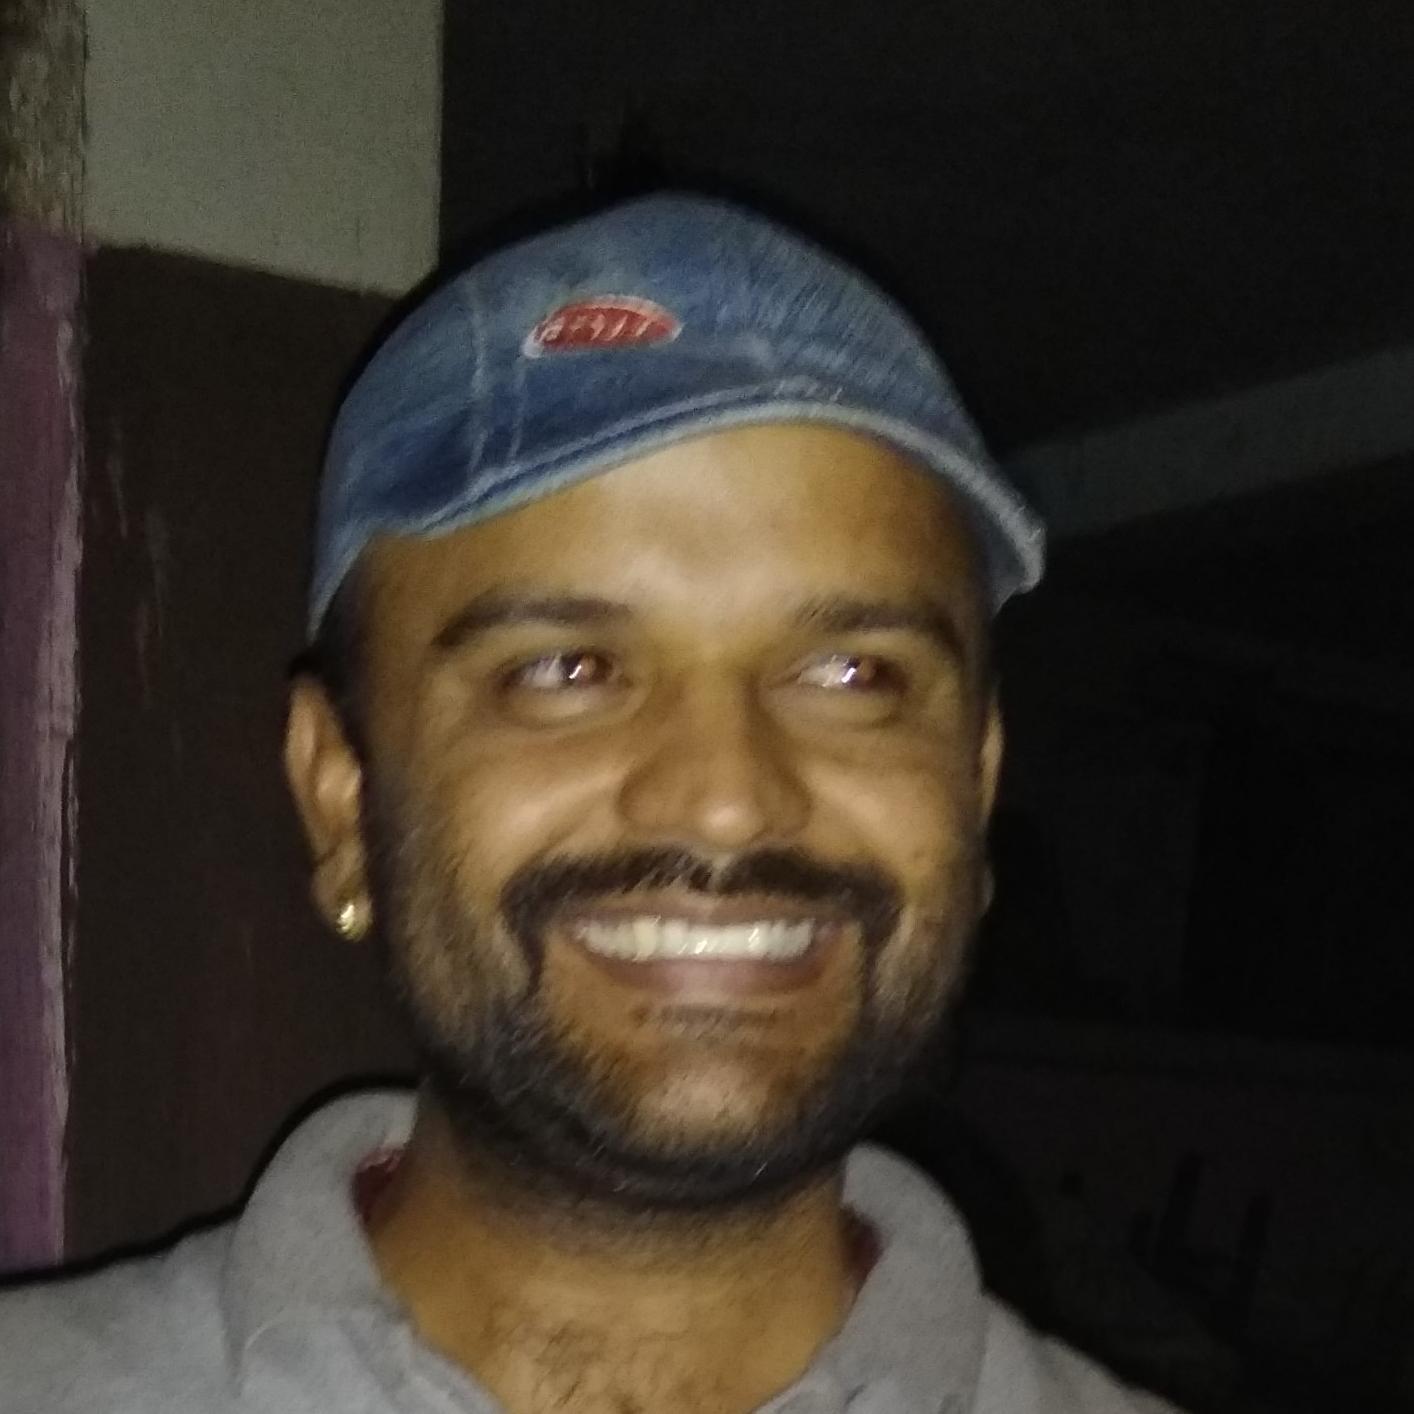 Akhilesh Goutam